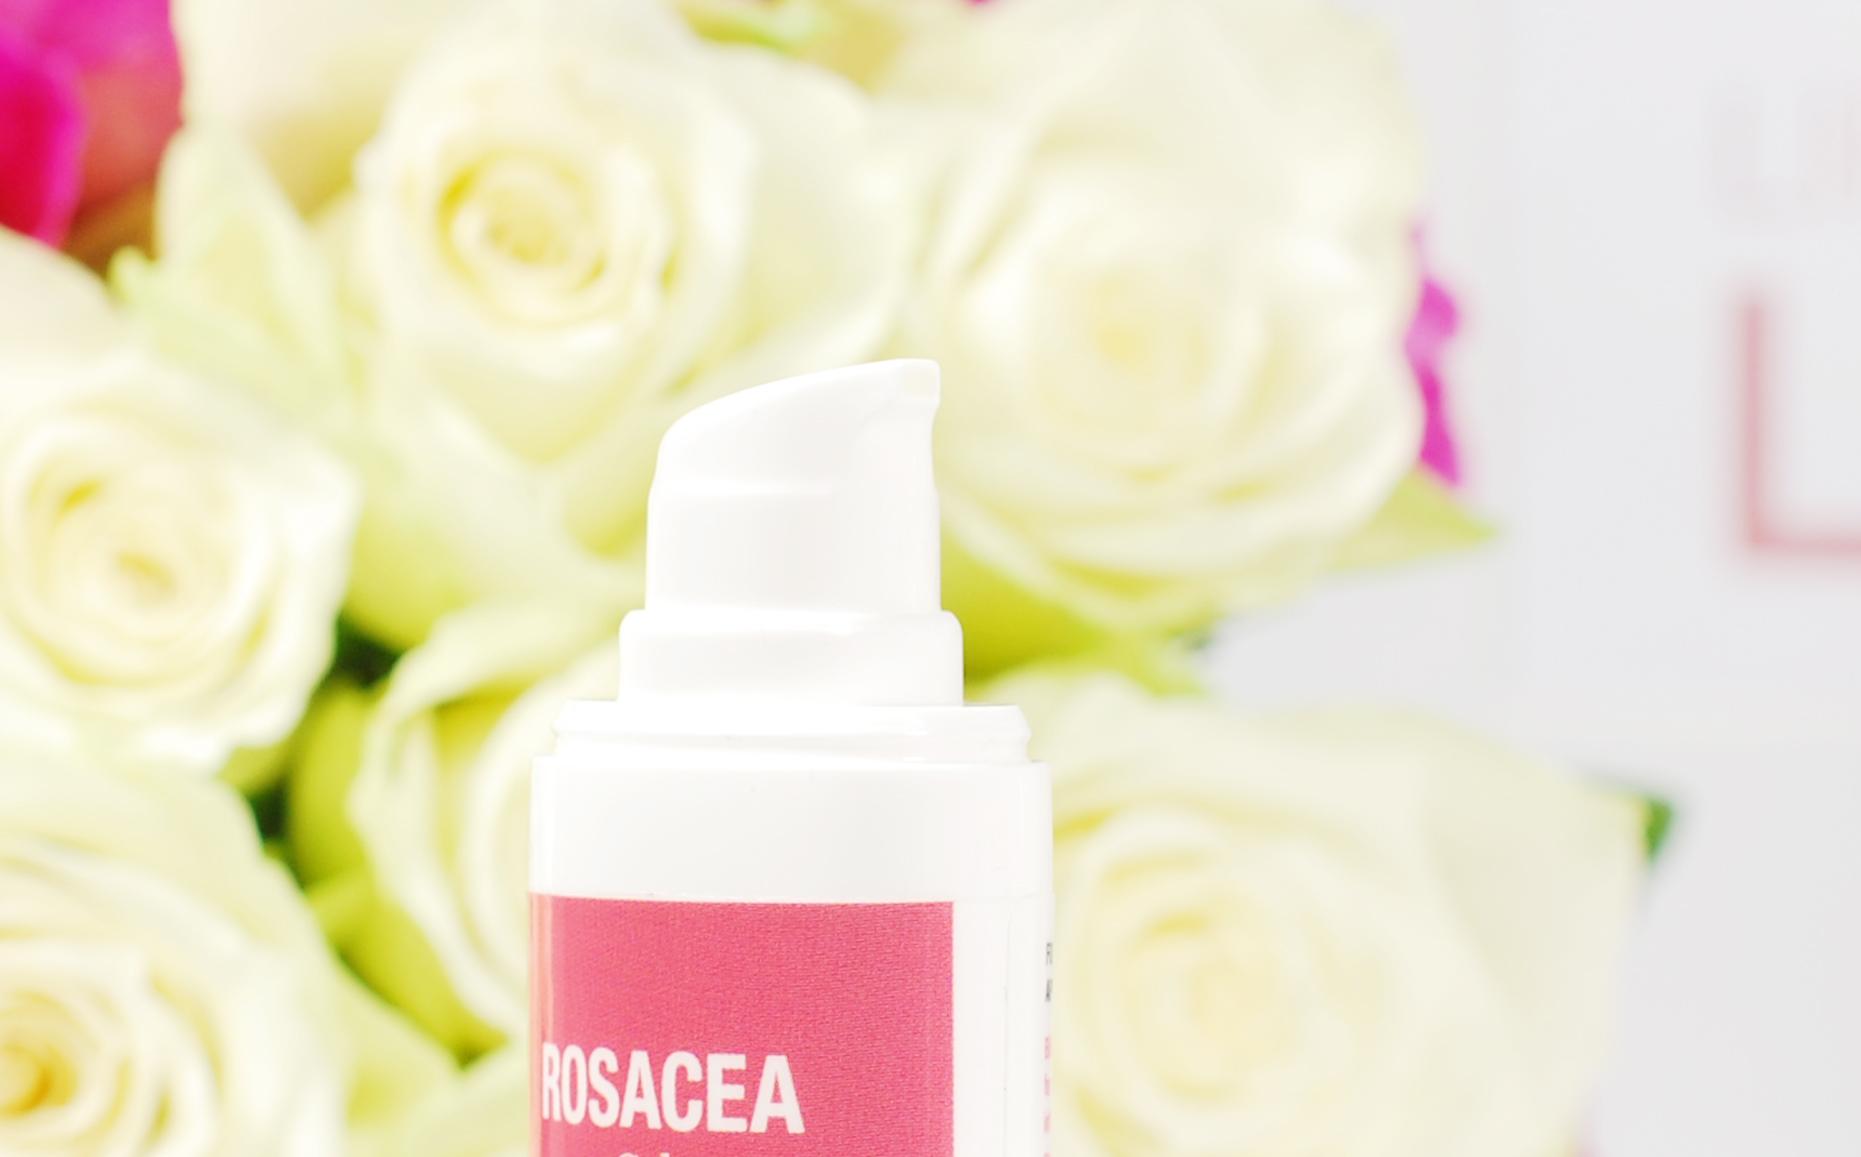 Rosacea gel hypoallergeen dermatologisch getest Glad skin bacterial skin balance probleem huid rood heden plekjes review lifestyle by linda skin care